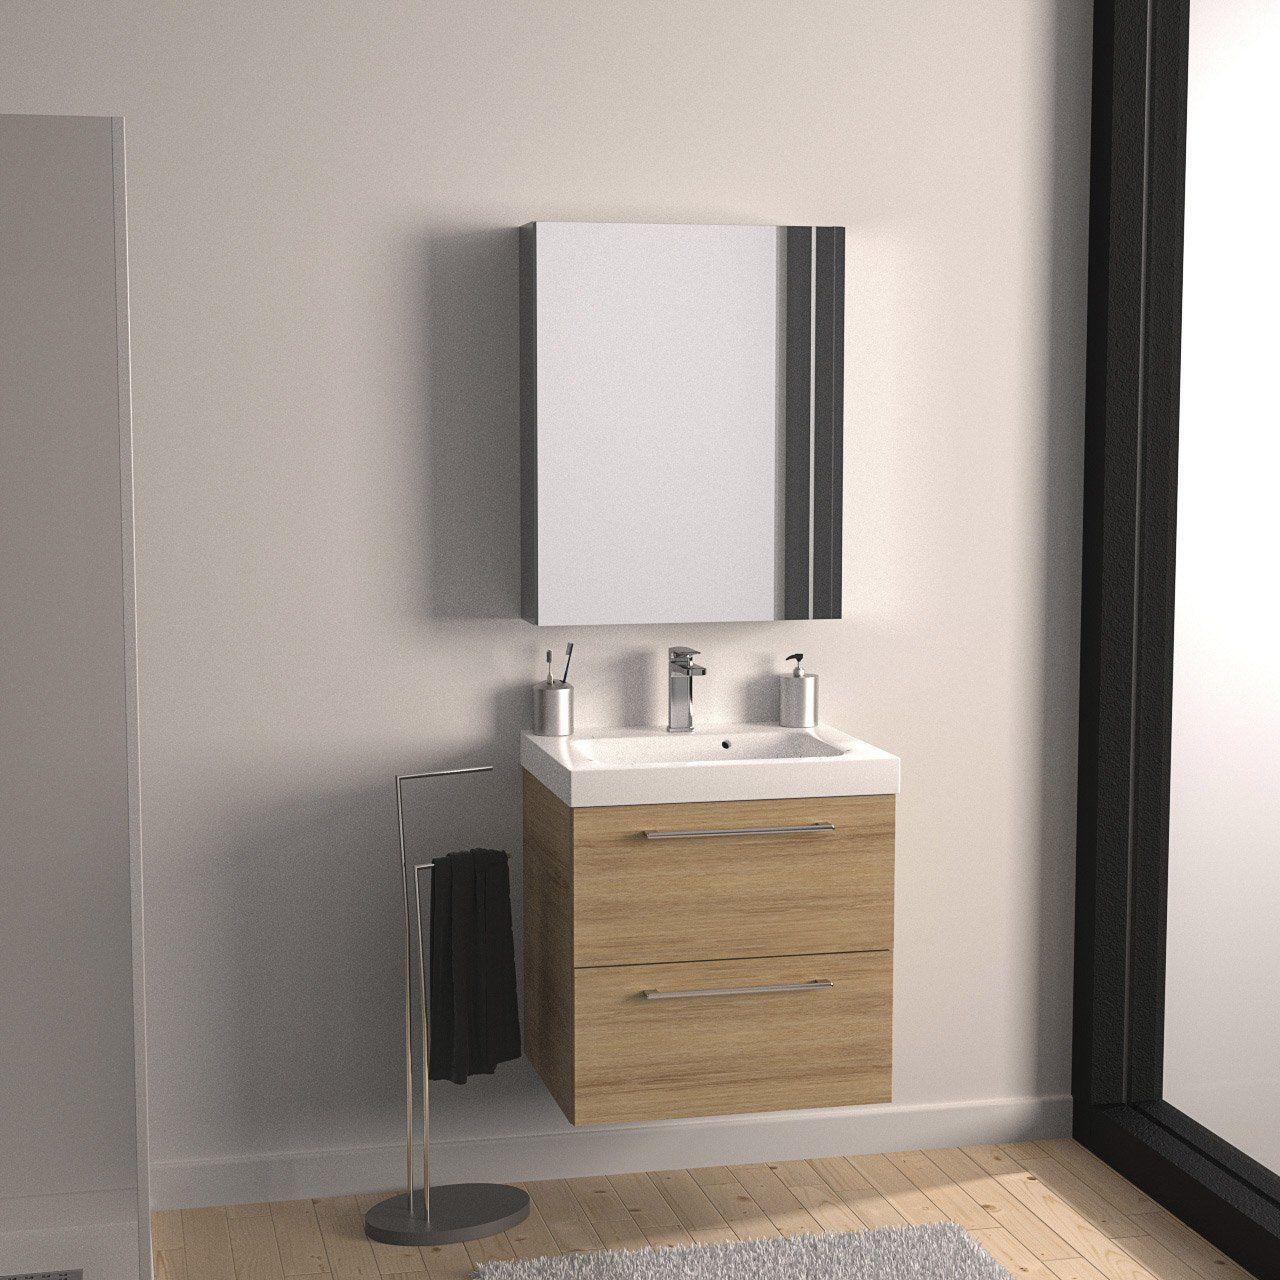 meuble de salle de bains remix imitation ch ne 61x48 5 cm 2 tiroirs leroy merlin home sweet. Black Bedroom Furniture Sets. Home Design Ideas